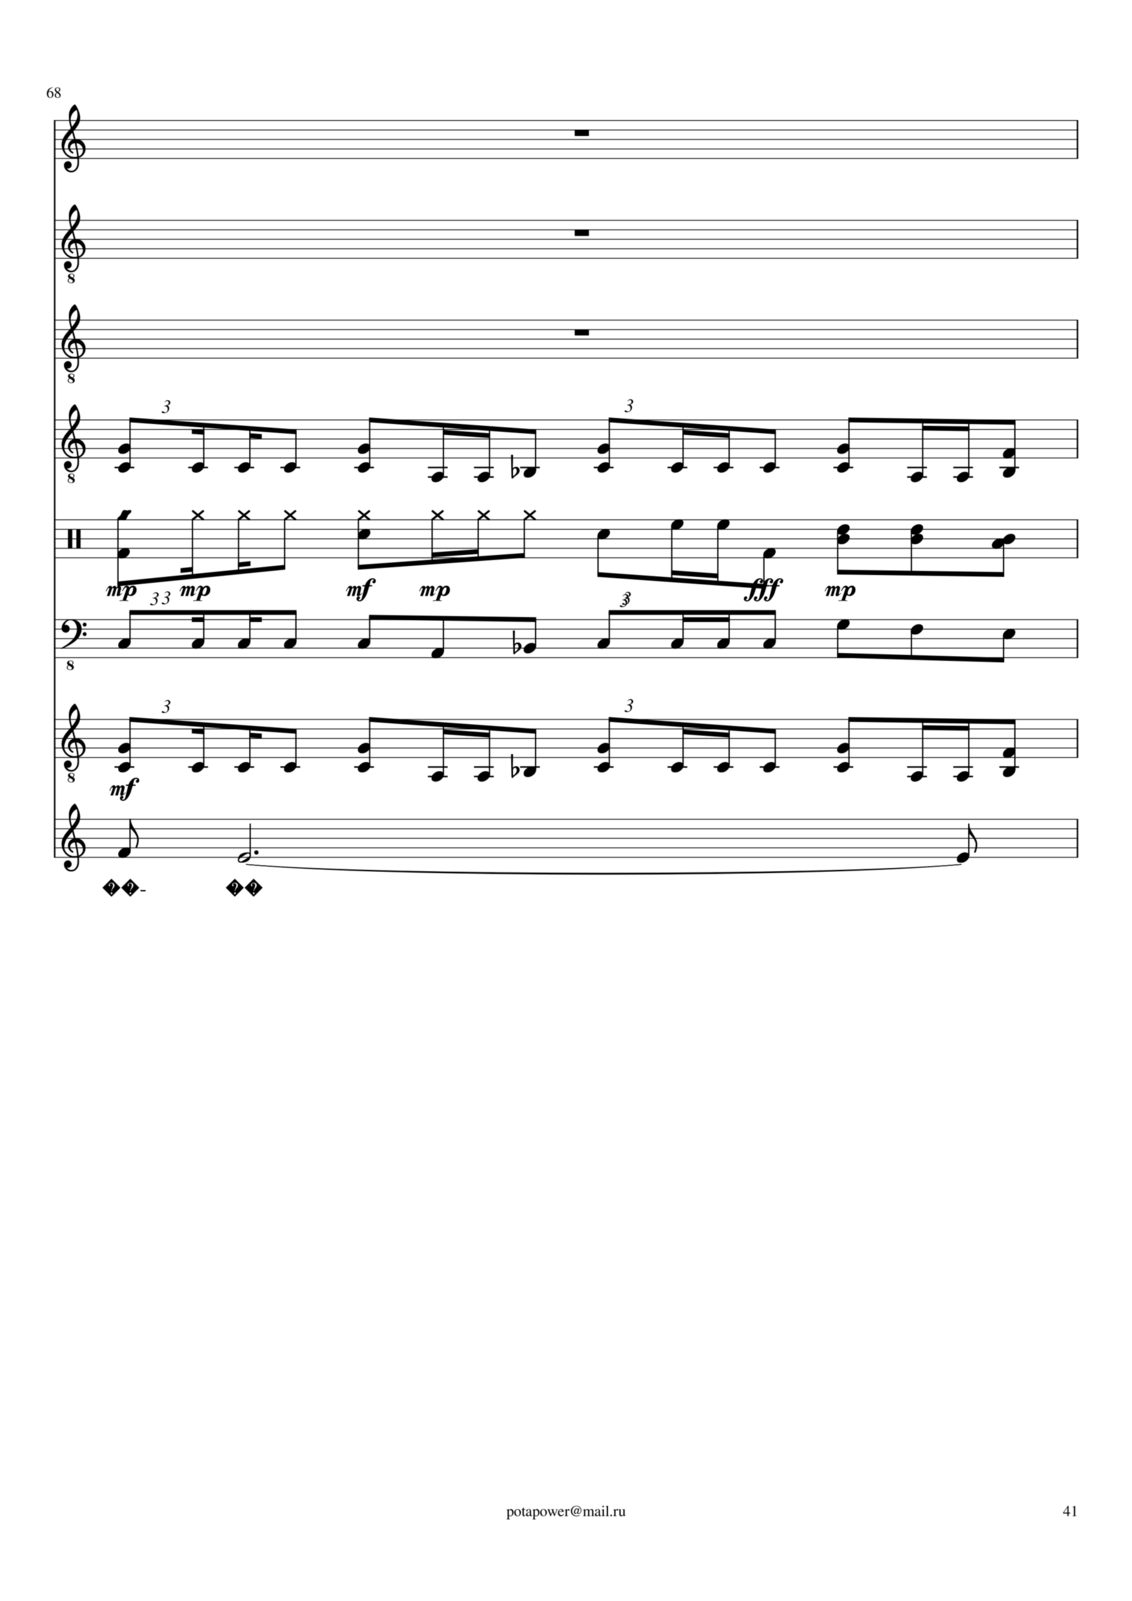 Korolevstvo slez slide, Image 41